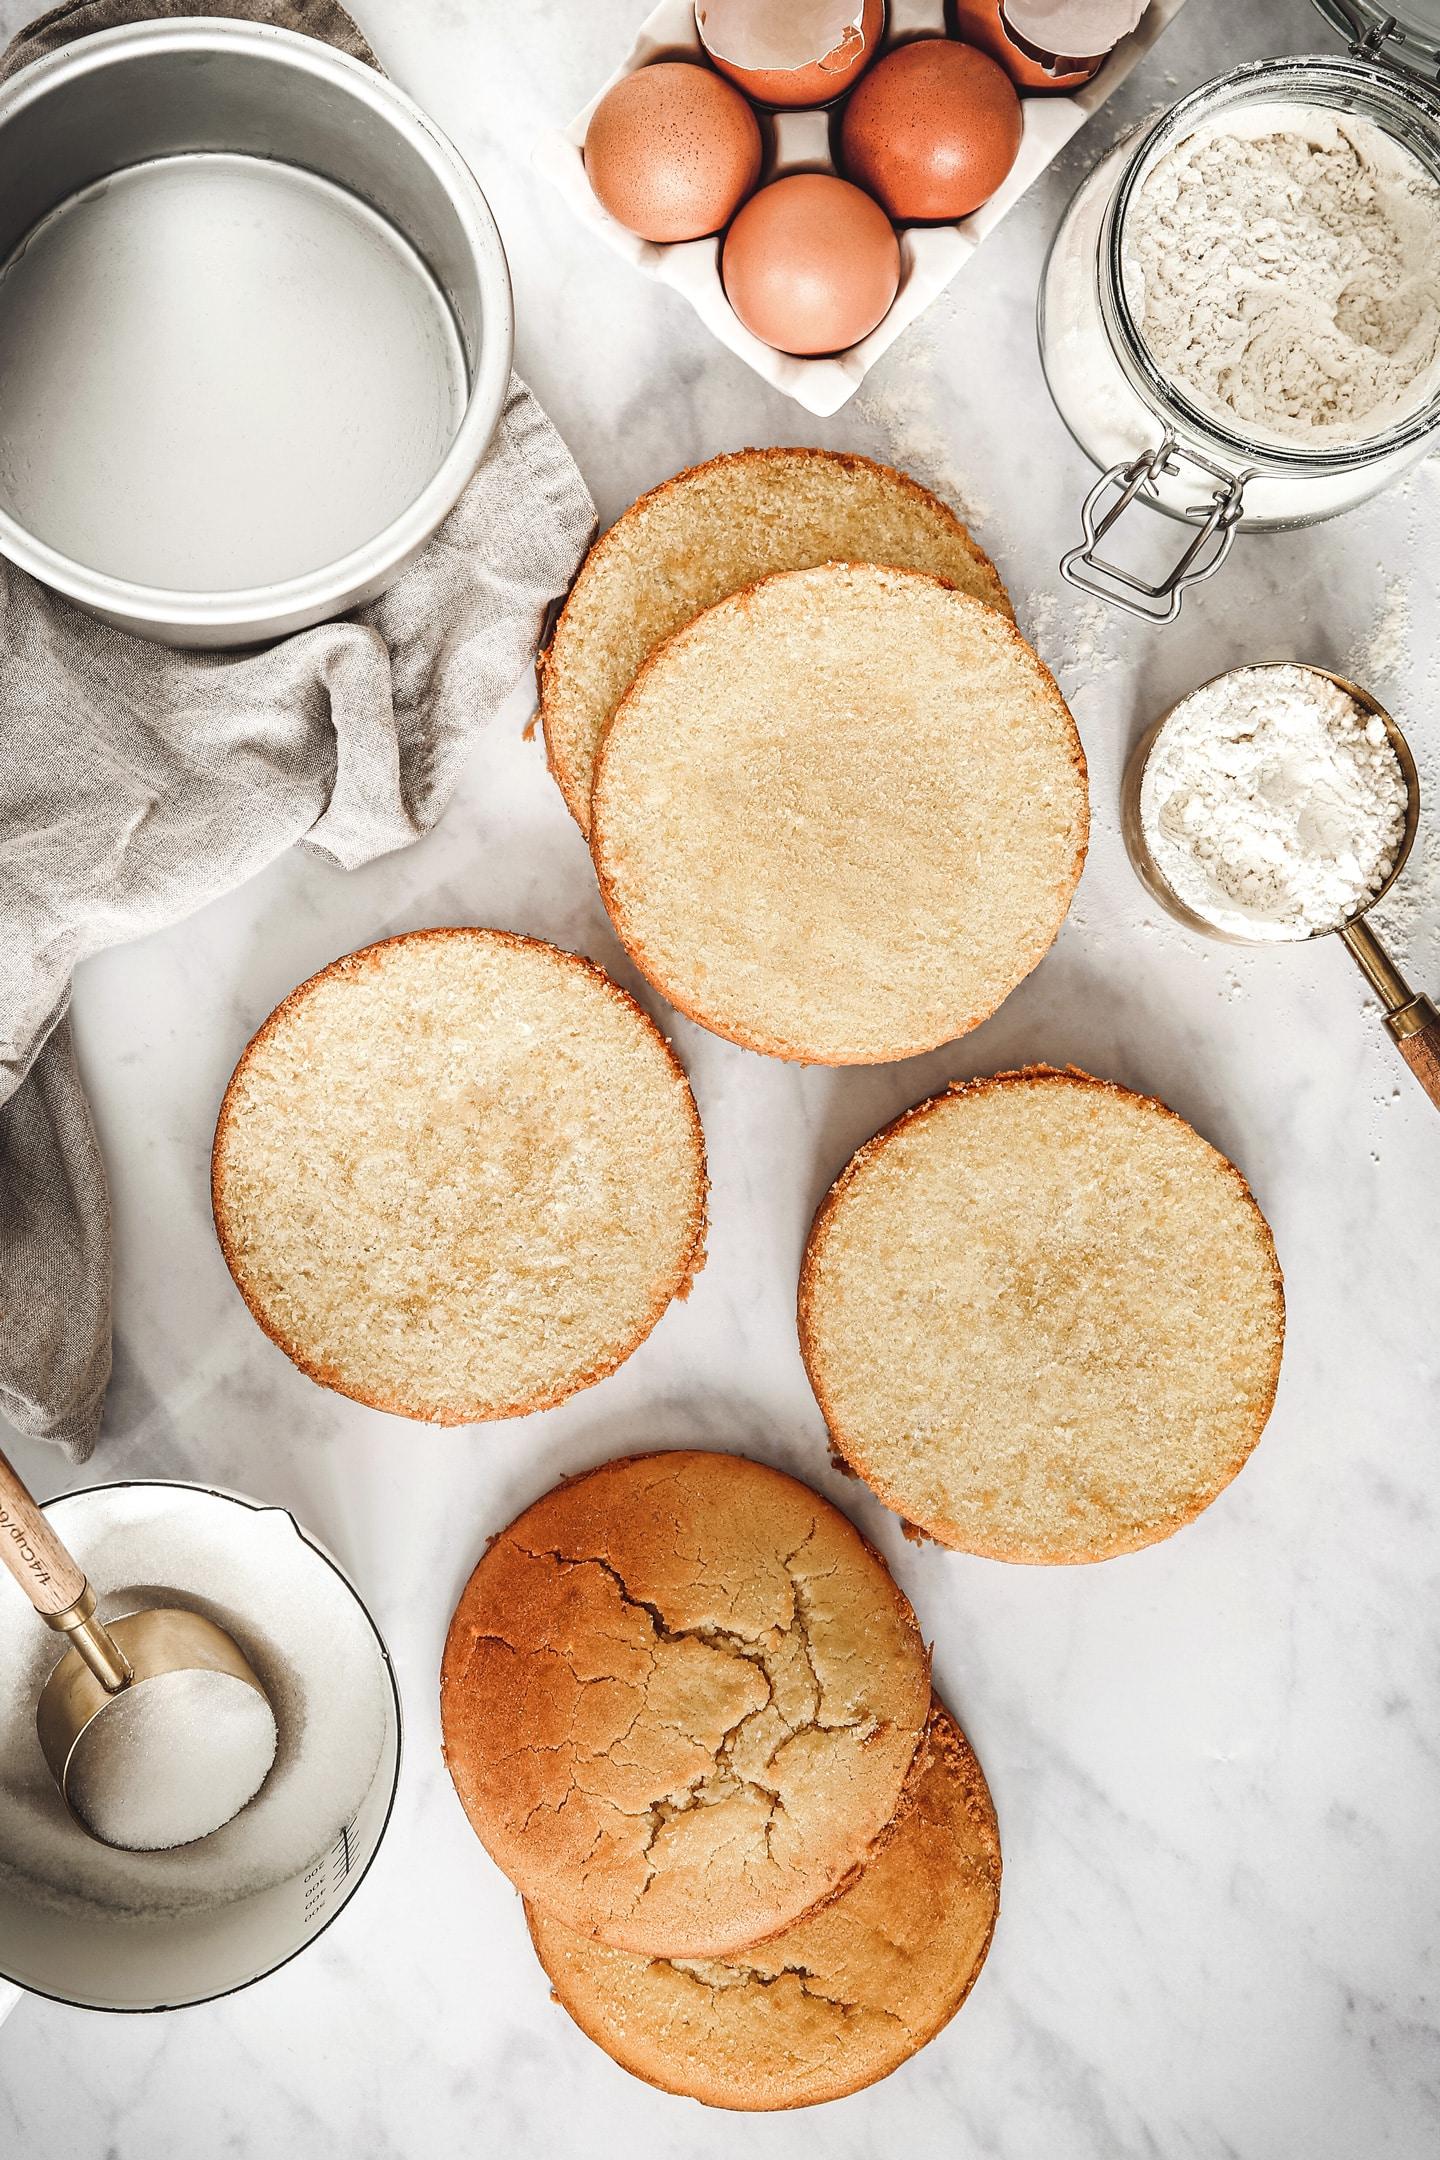 Best sponge cake recipe